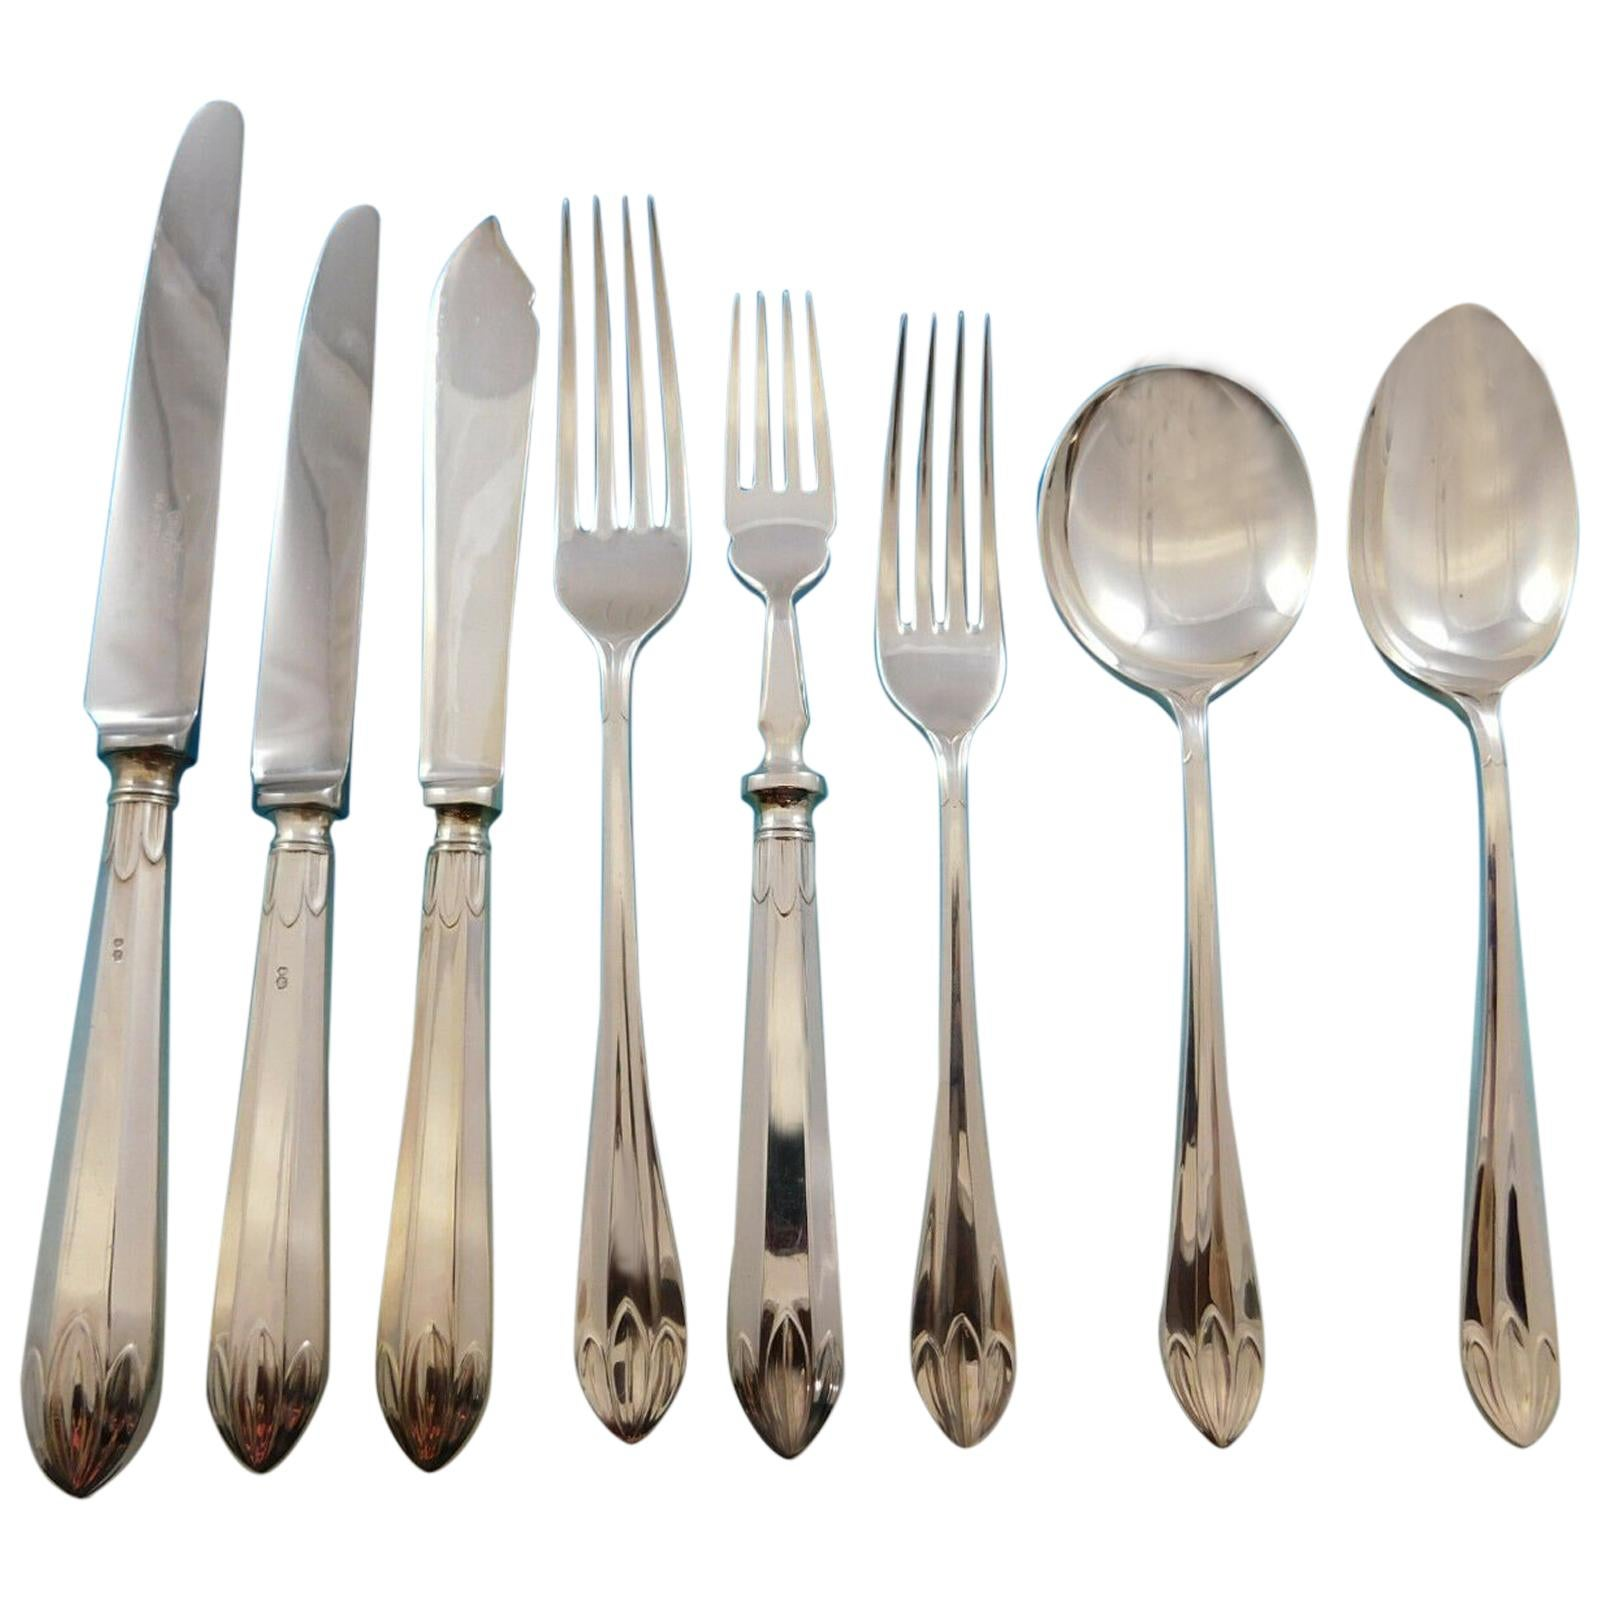 Lotus Orchid Mappin & Webb Sterling Silver Flatware Set Service Dinner 66 Pcs